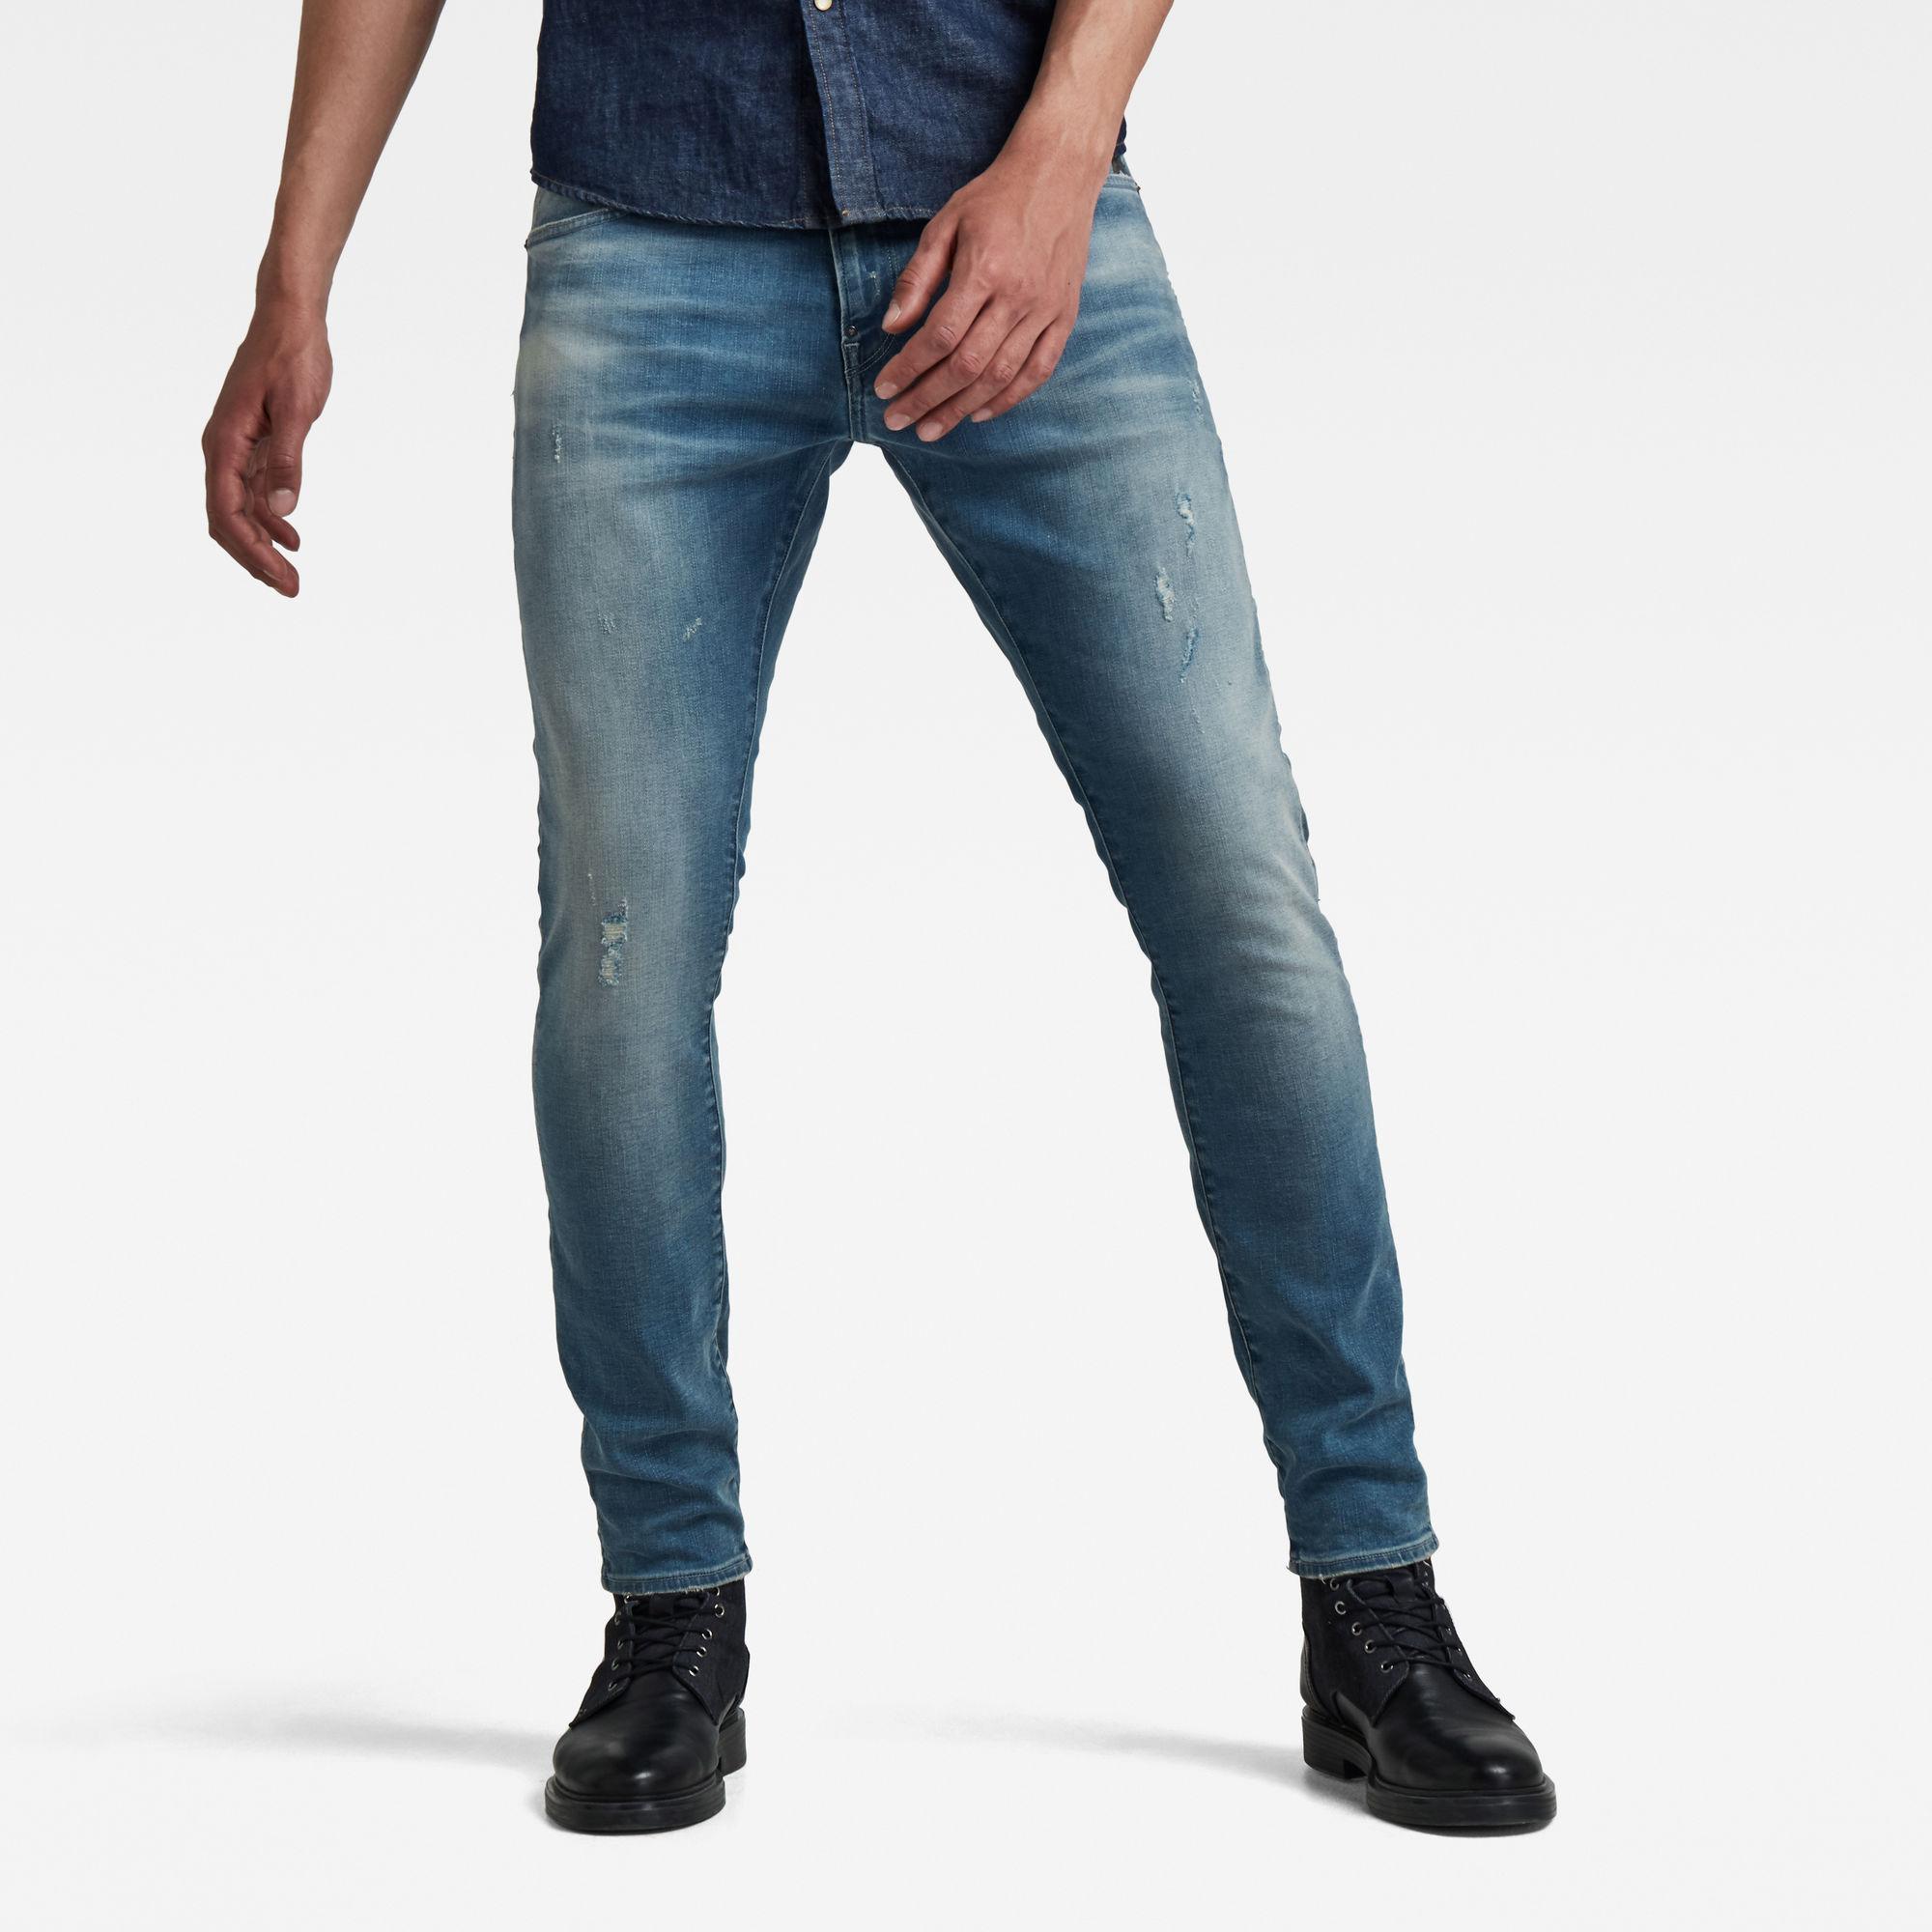 G-Star RAW Hombre Jeans Revend Skinny Azul intermedio